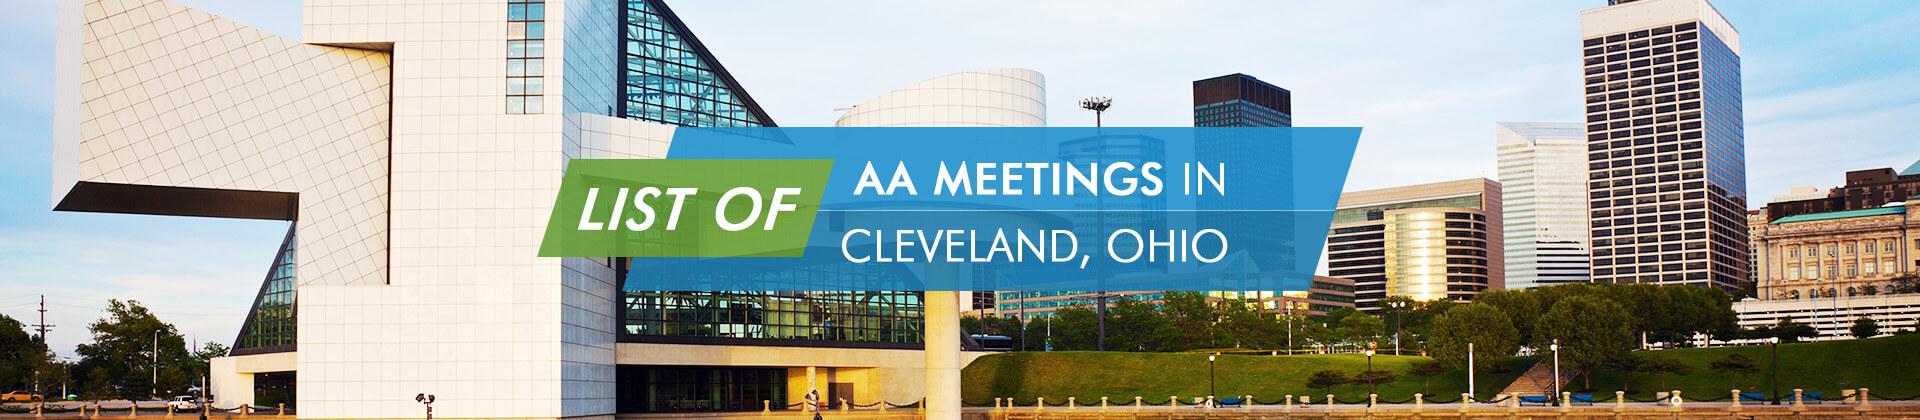 AA Meetings Cleveland Ohio